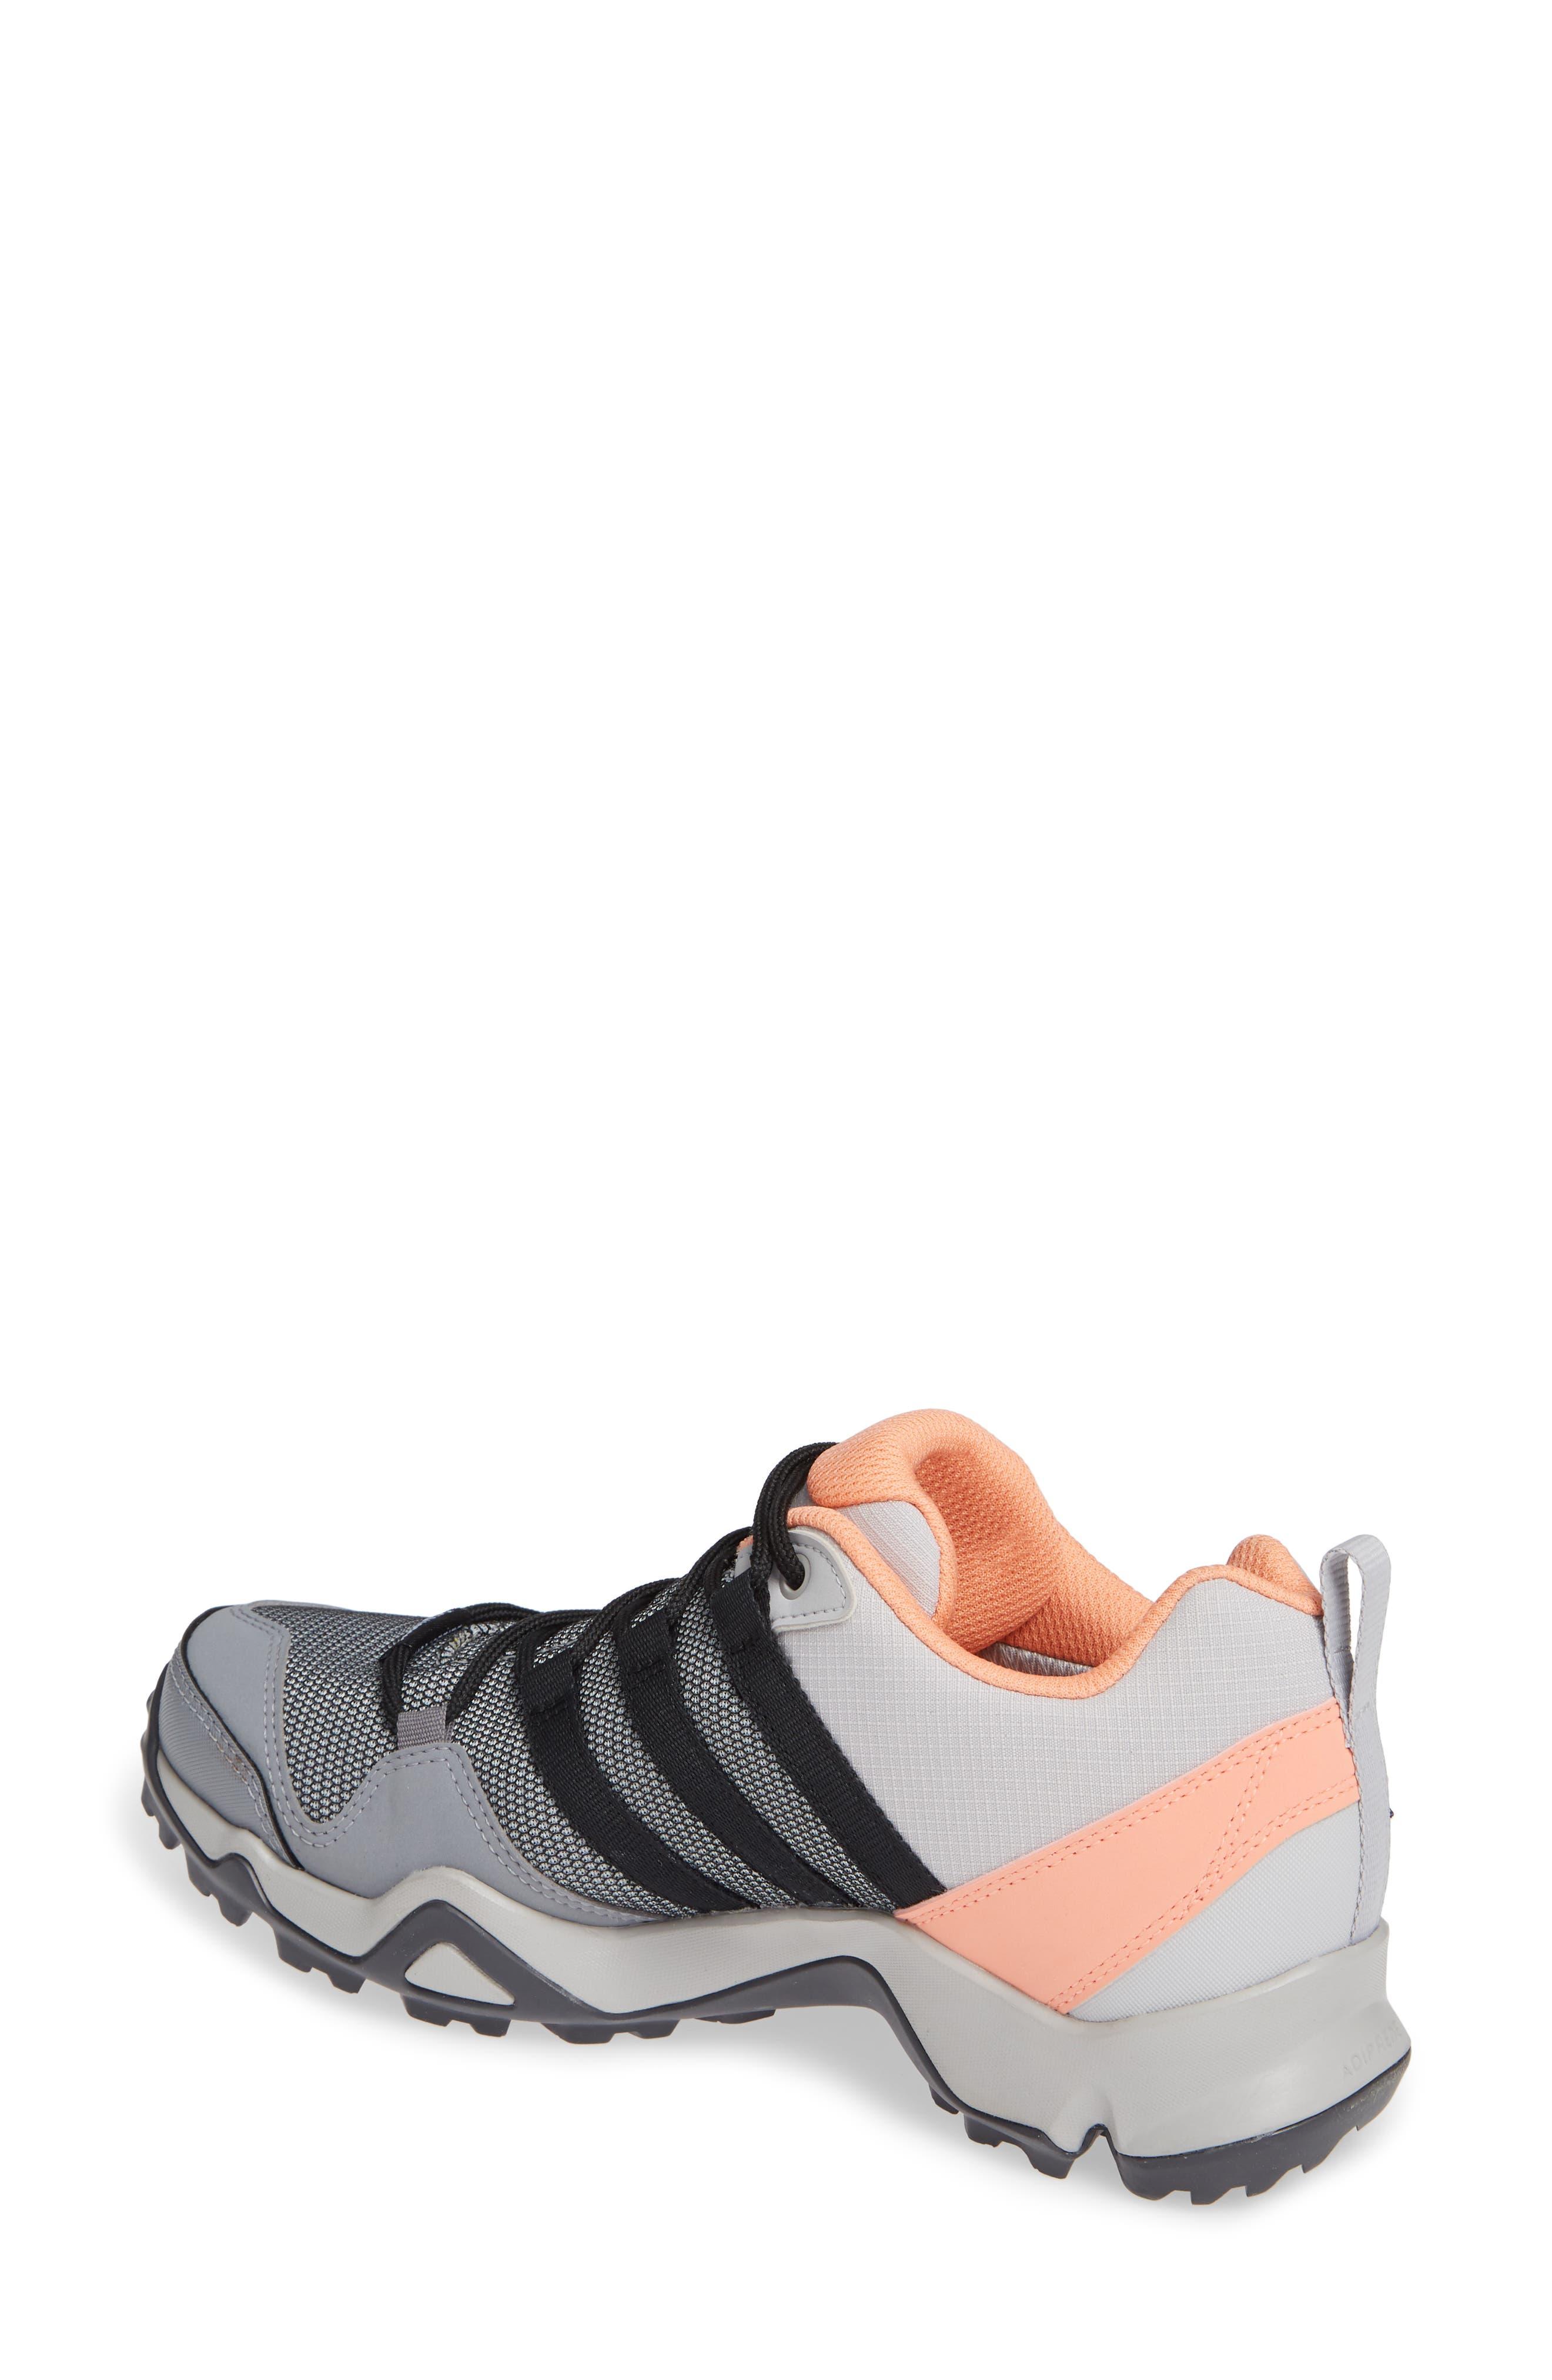 Terrex AX2 CLIMAPROOF<sup>®</sup> Hiking Shoe,                             Alternate thumbnail 2, color,                             GREY/ BLACK/ CHALK CORAL